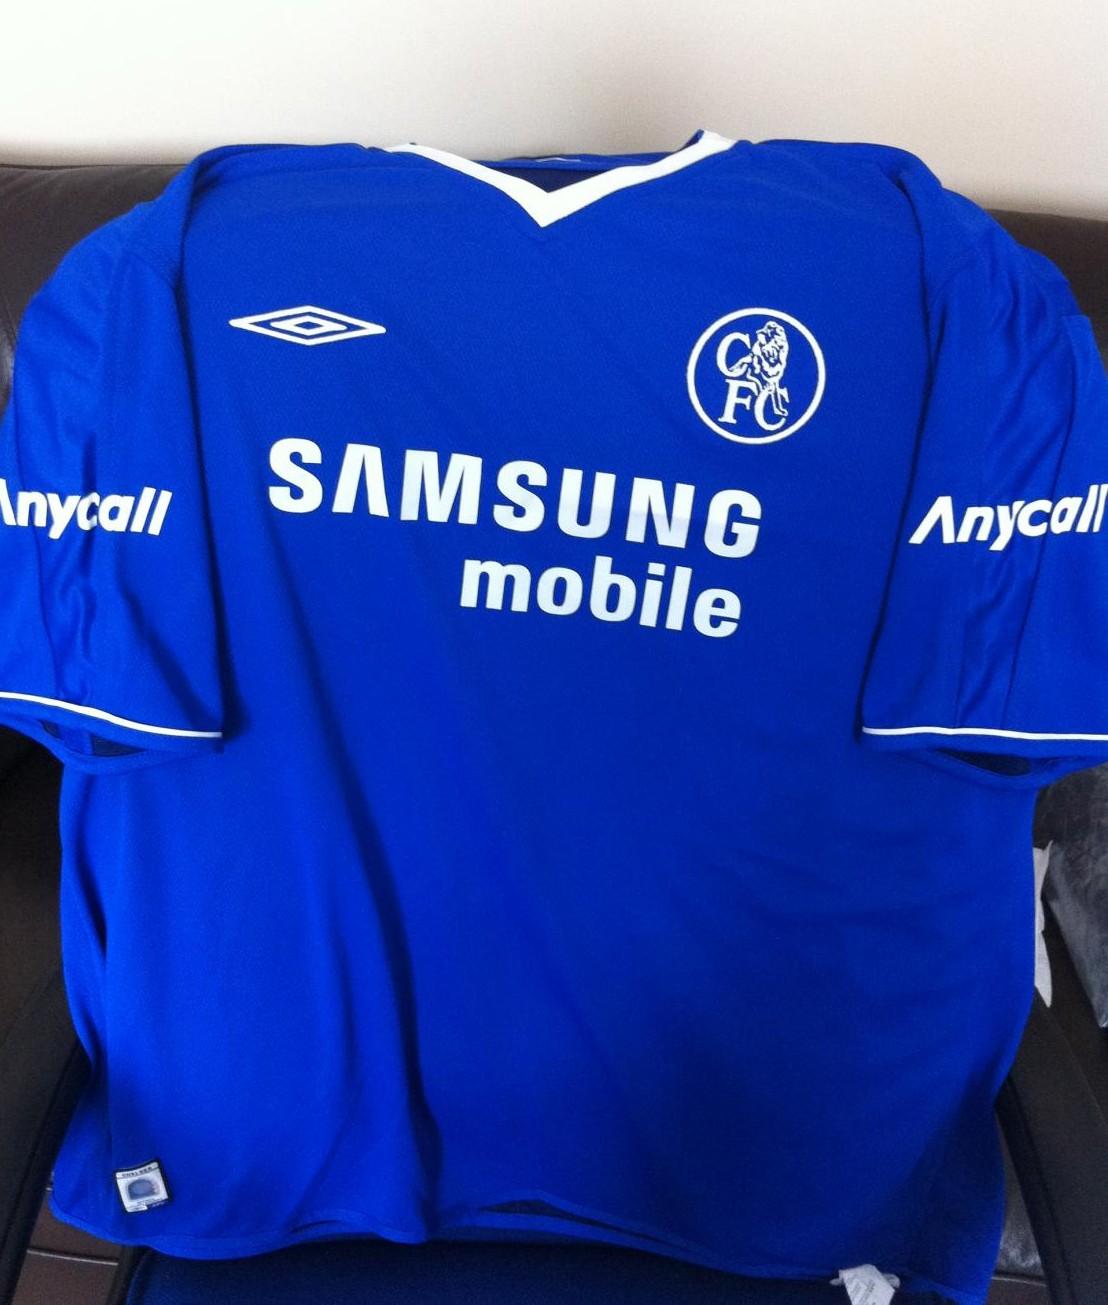 new concept 6c0b0 8d8fe Chelsea Special Camiseta de Fútbol 2004 - 2005. Sponsored by ...